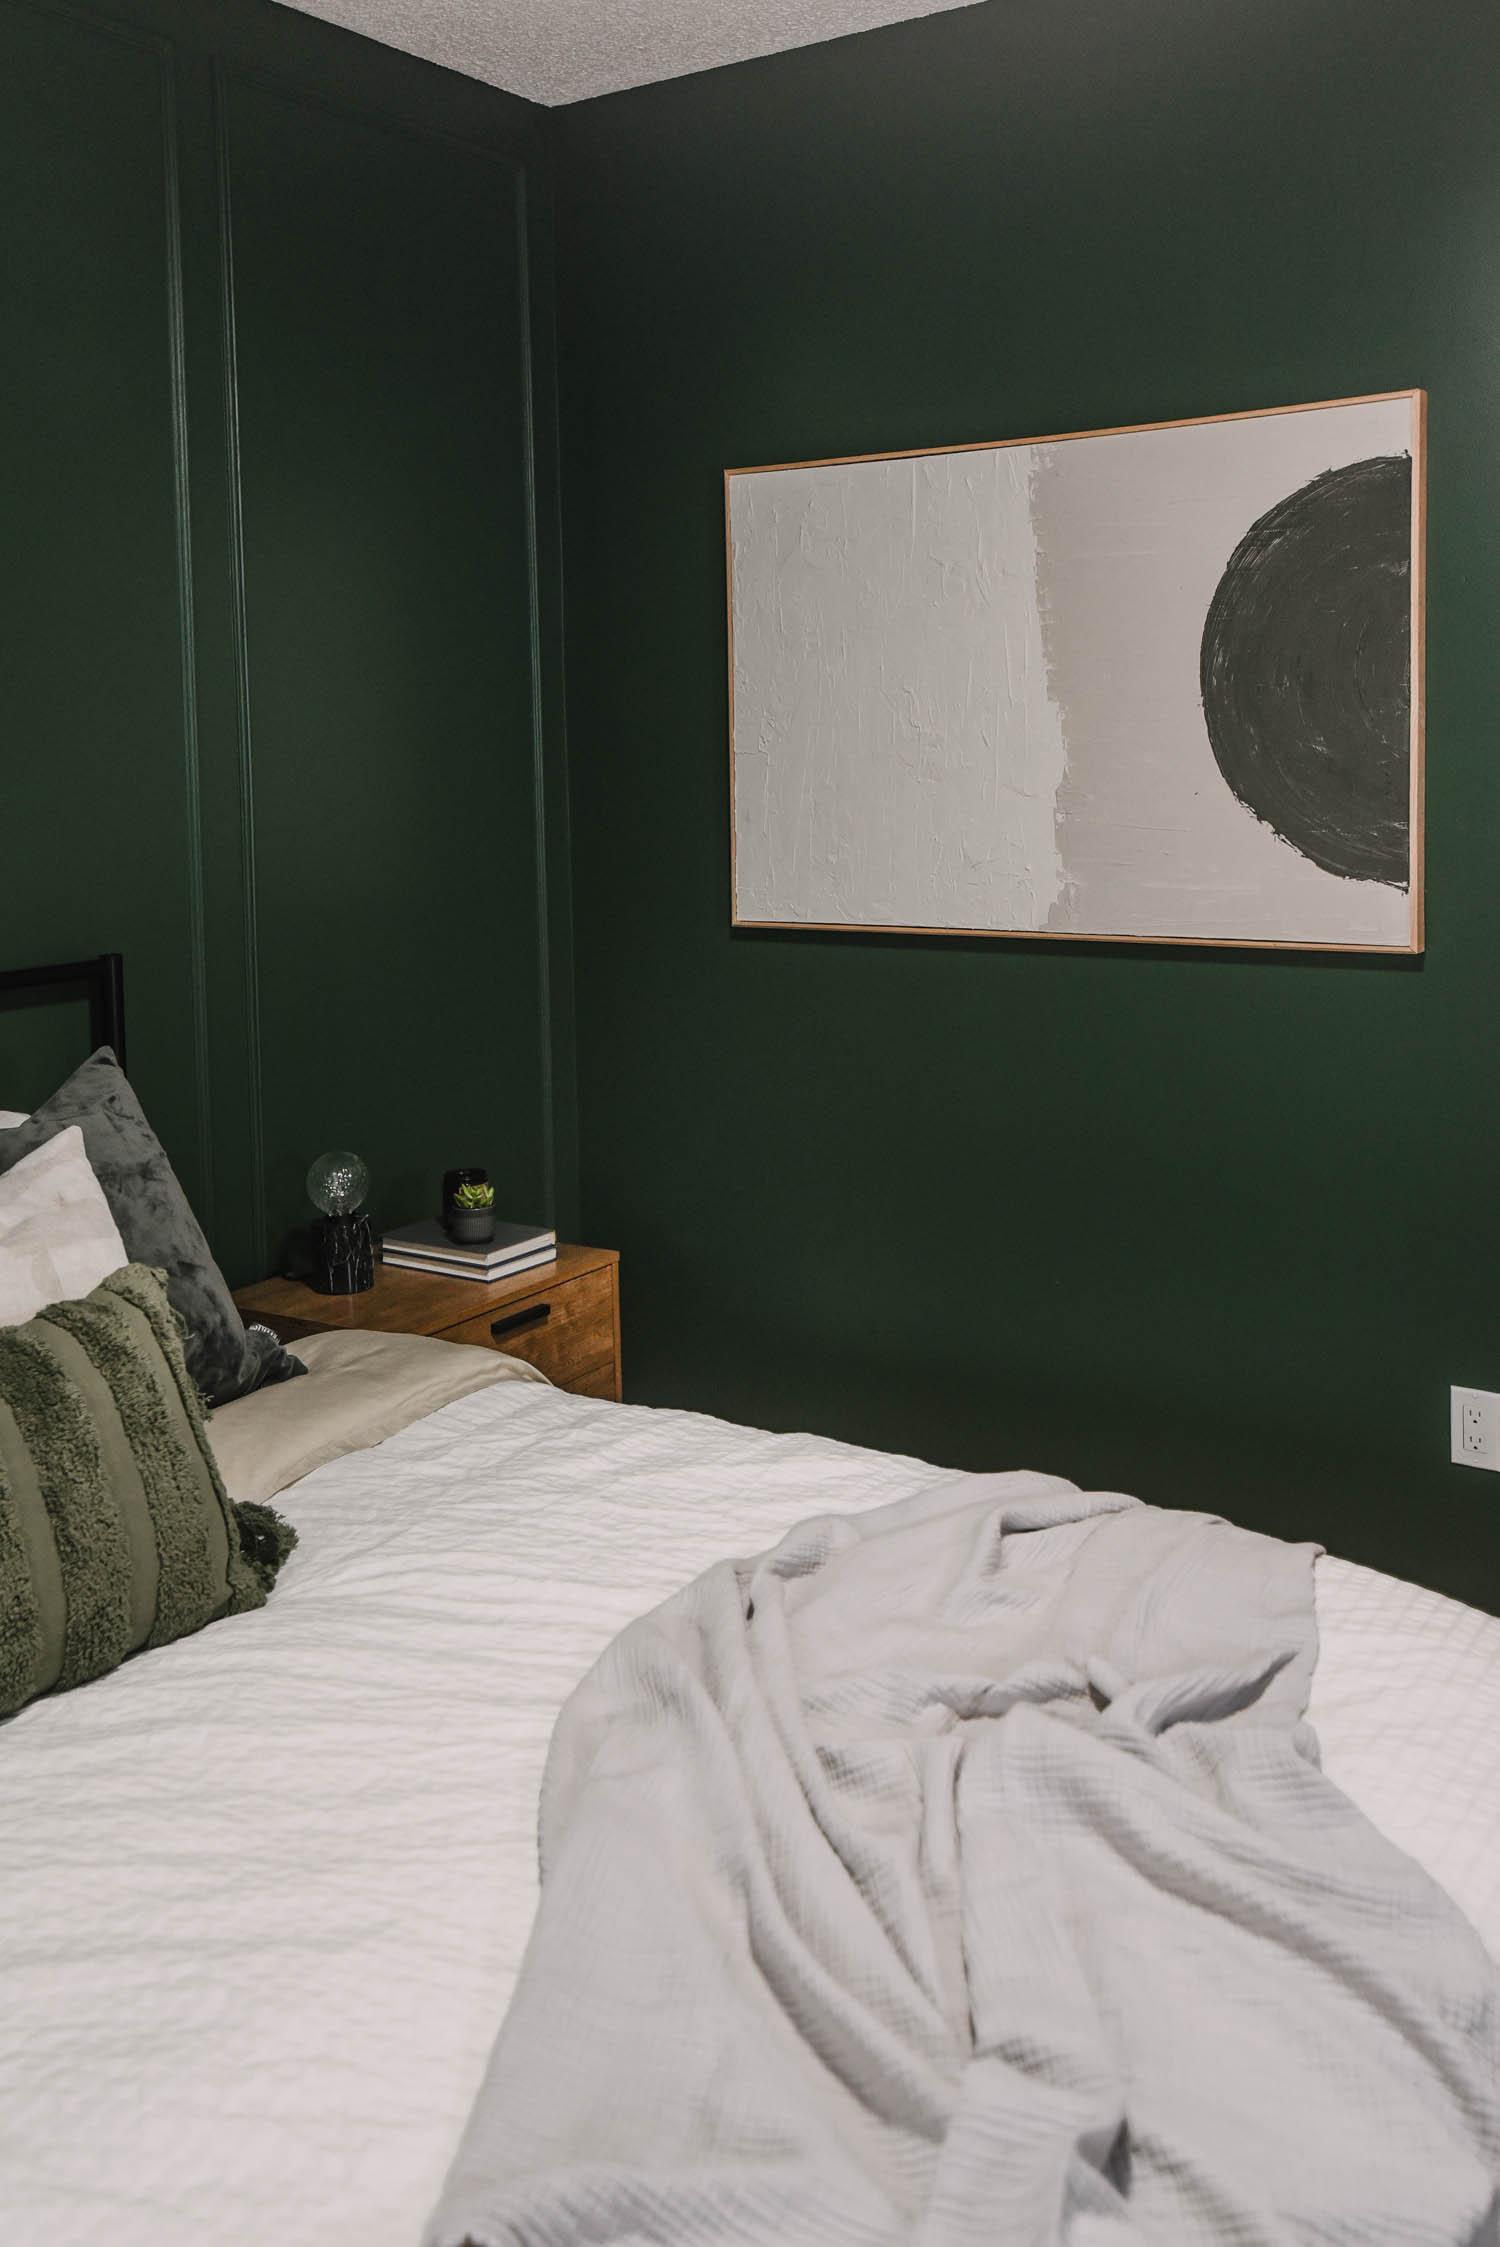 DIY Wall art in a bedroom makeover